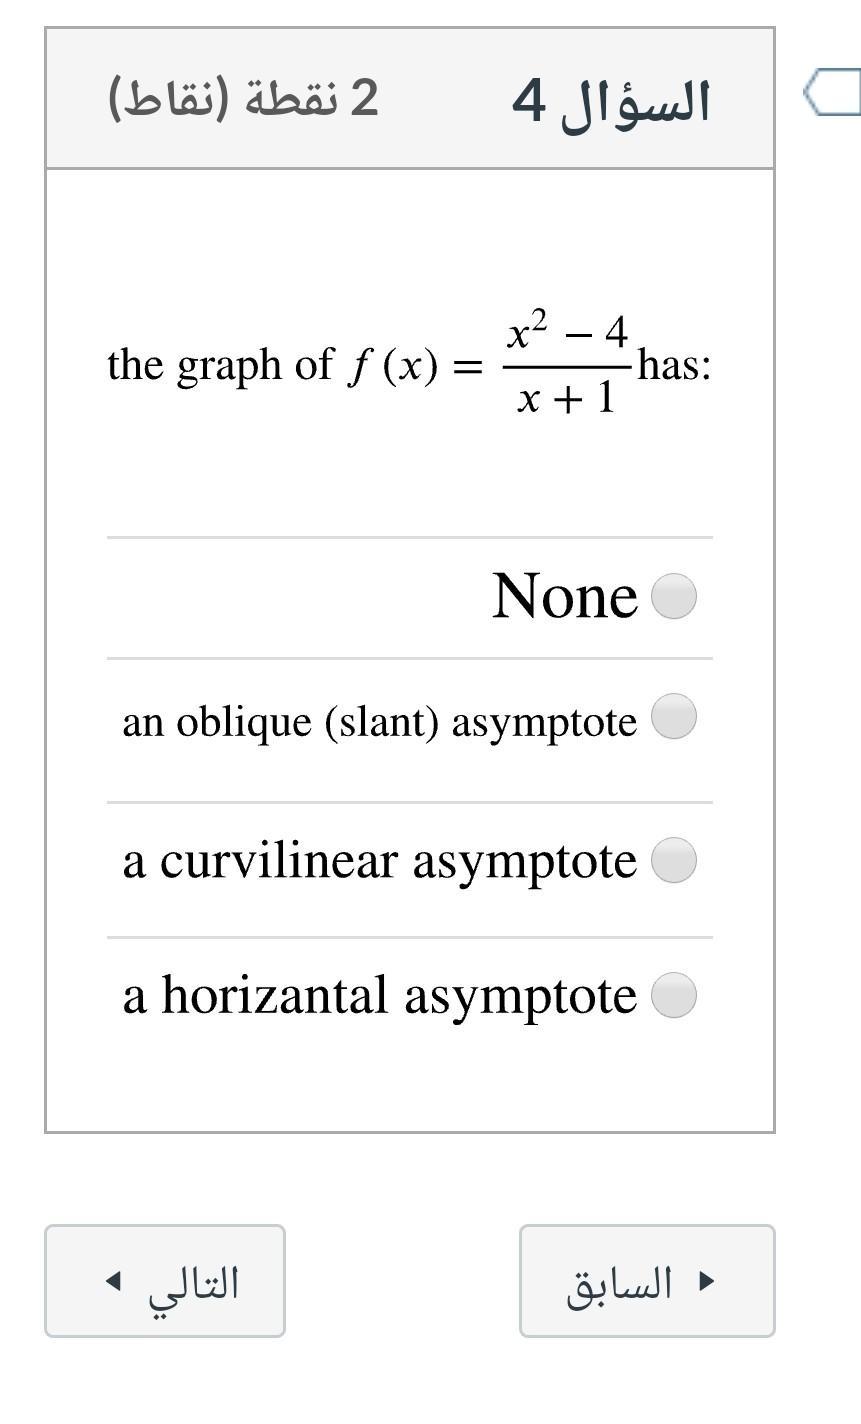 2 نقطة (نقاط) السؤال 4 x2 the graph of f (x) = 4 has: x +1 None an oblique (slant) asymptote a curvilinear asymptote a horiza